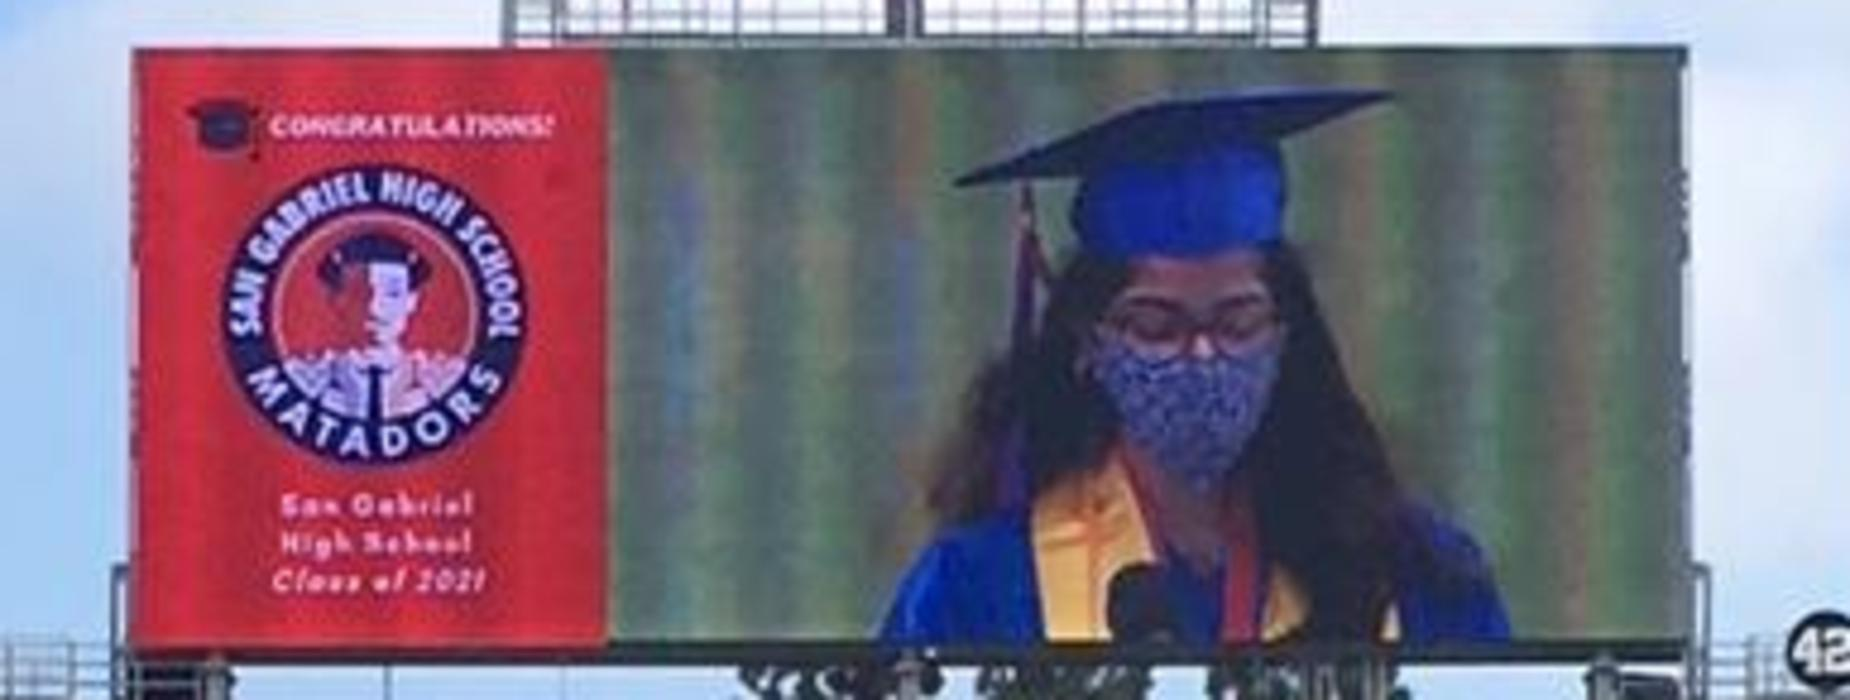 SGHS 2021 Graduate on screen